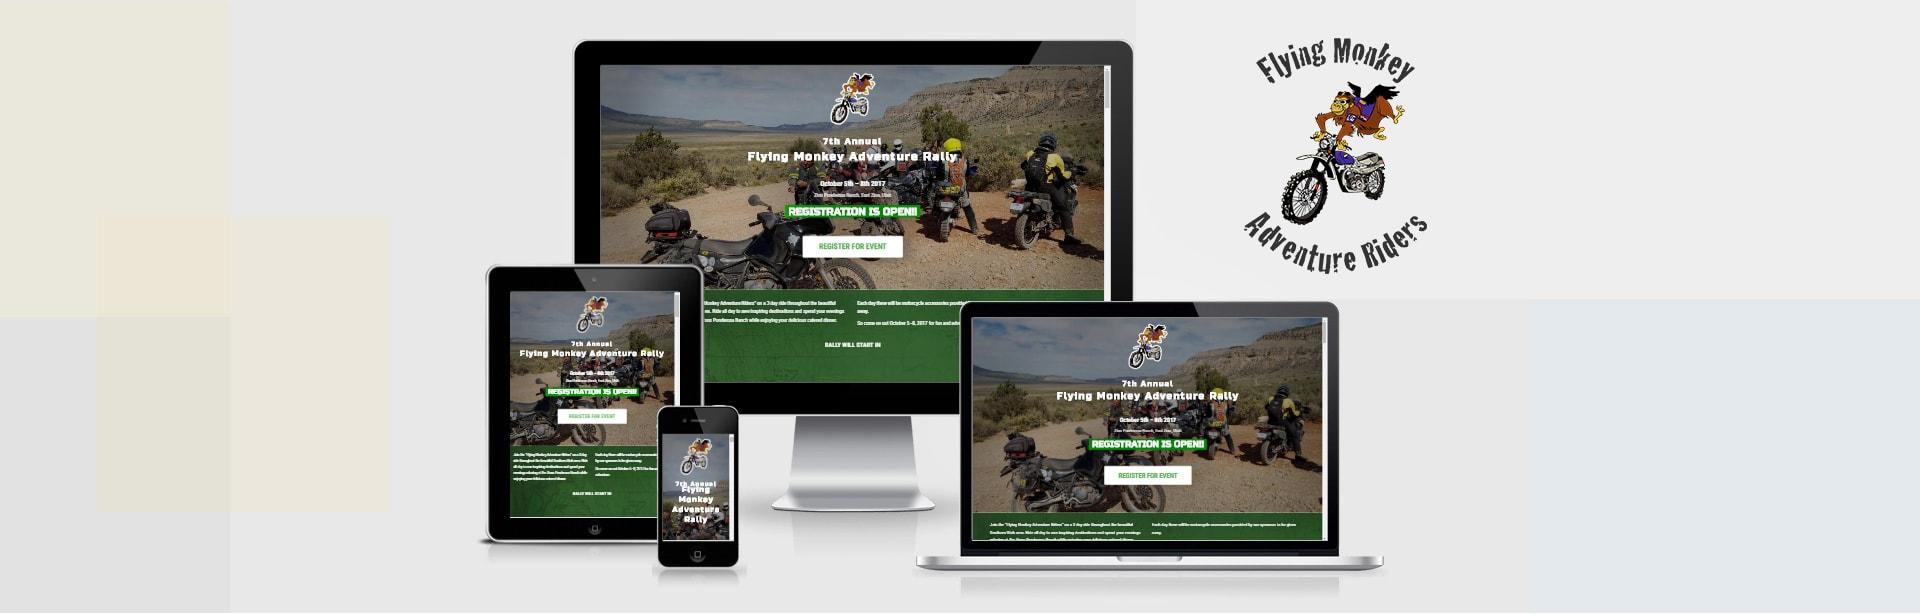 Flying Monkey Rally website